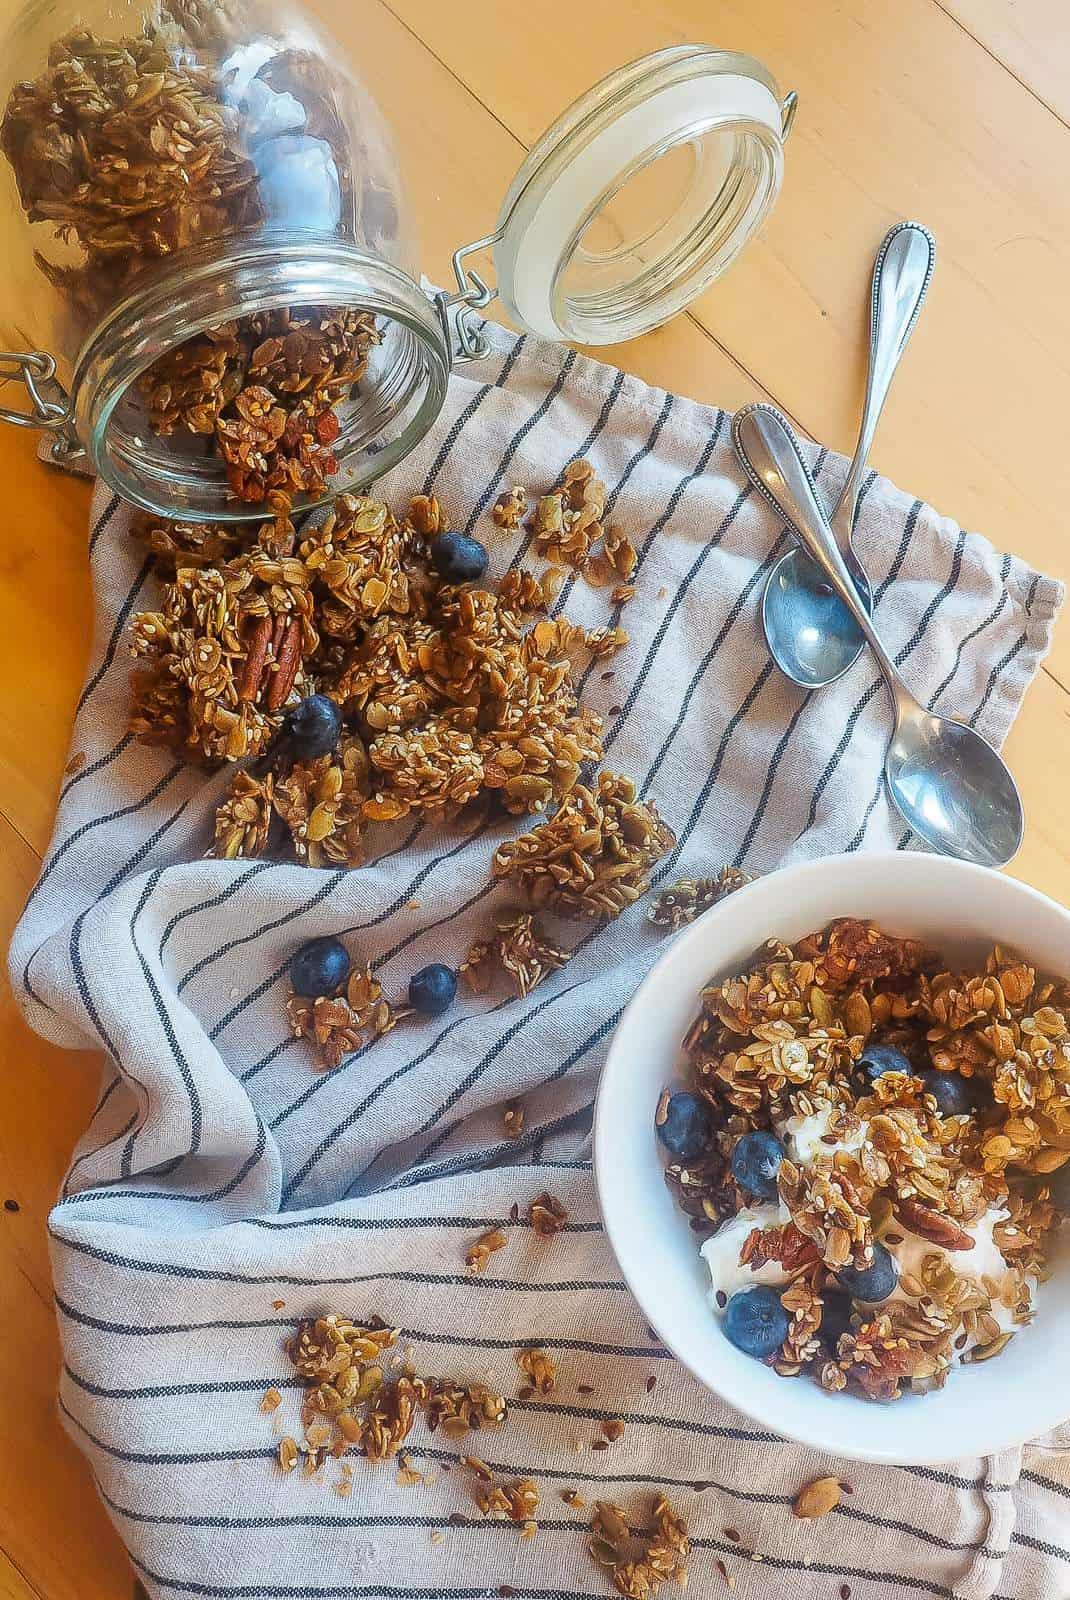 A bowl of granola and yogurt next to spilled granola.